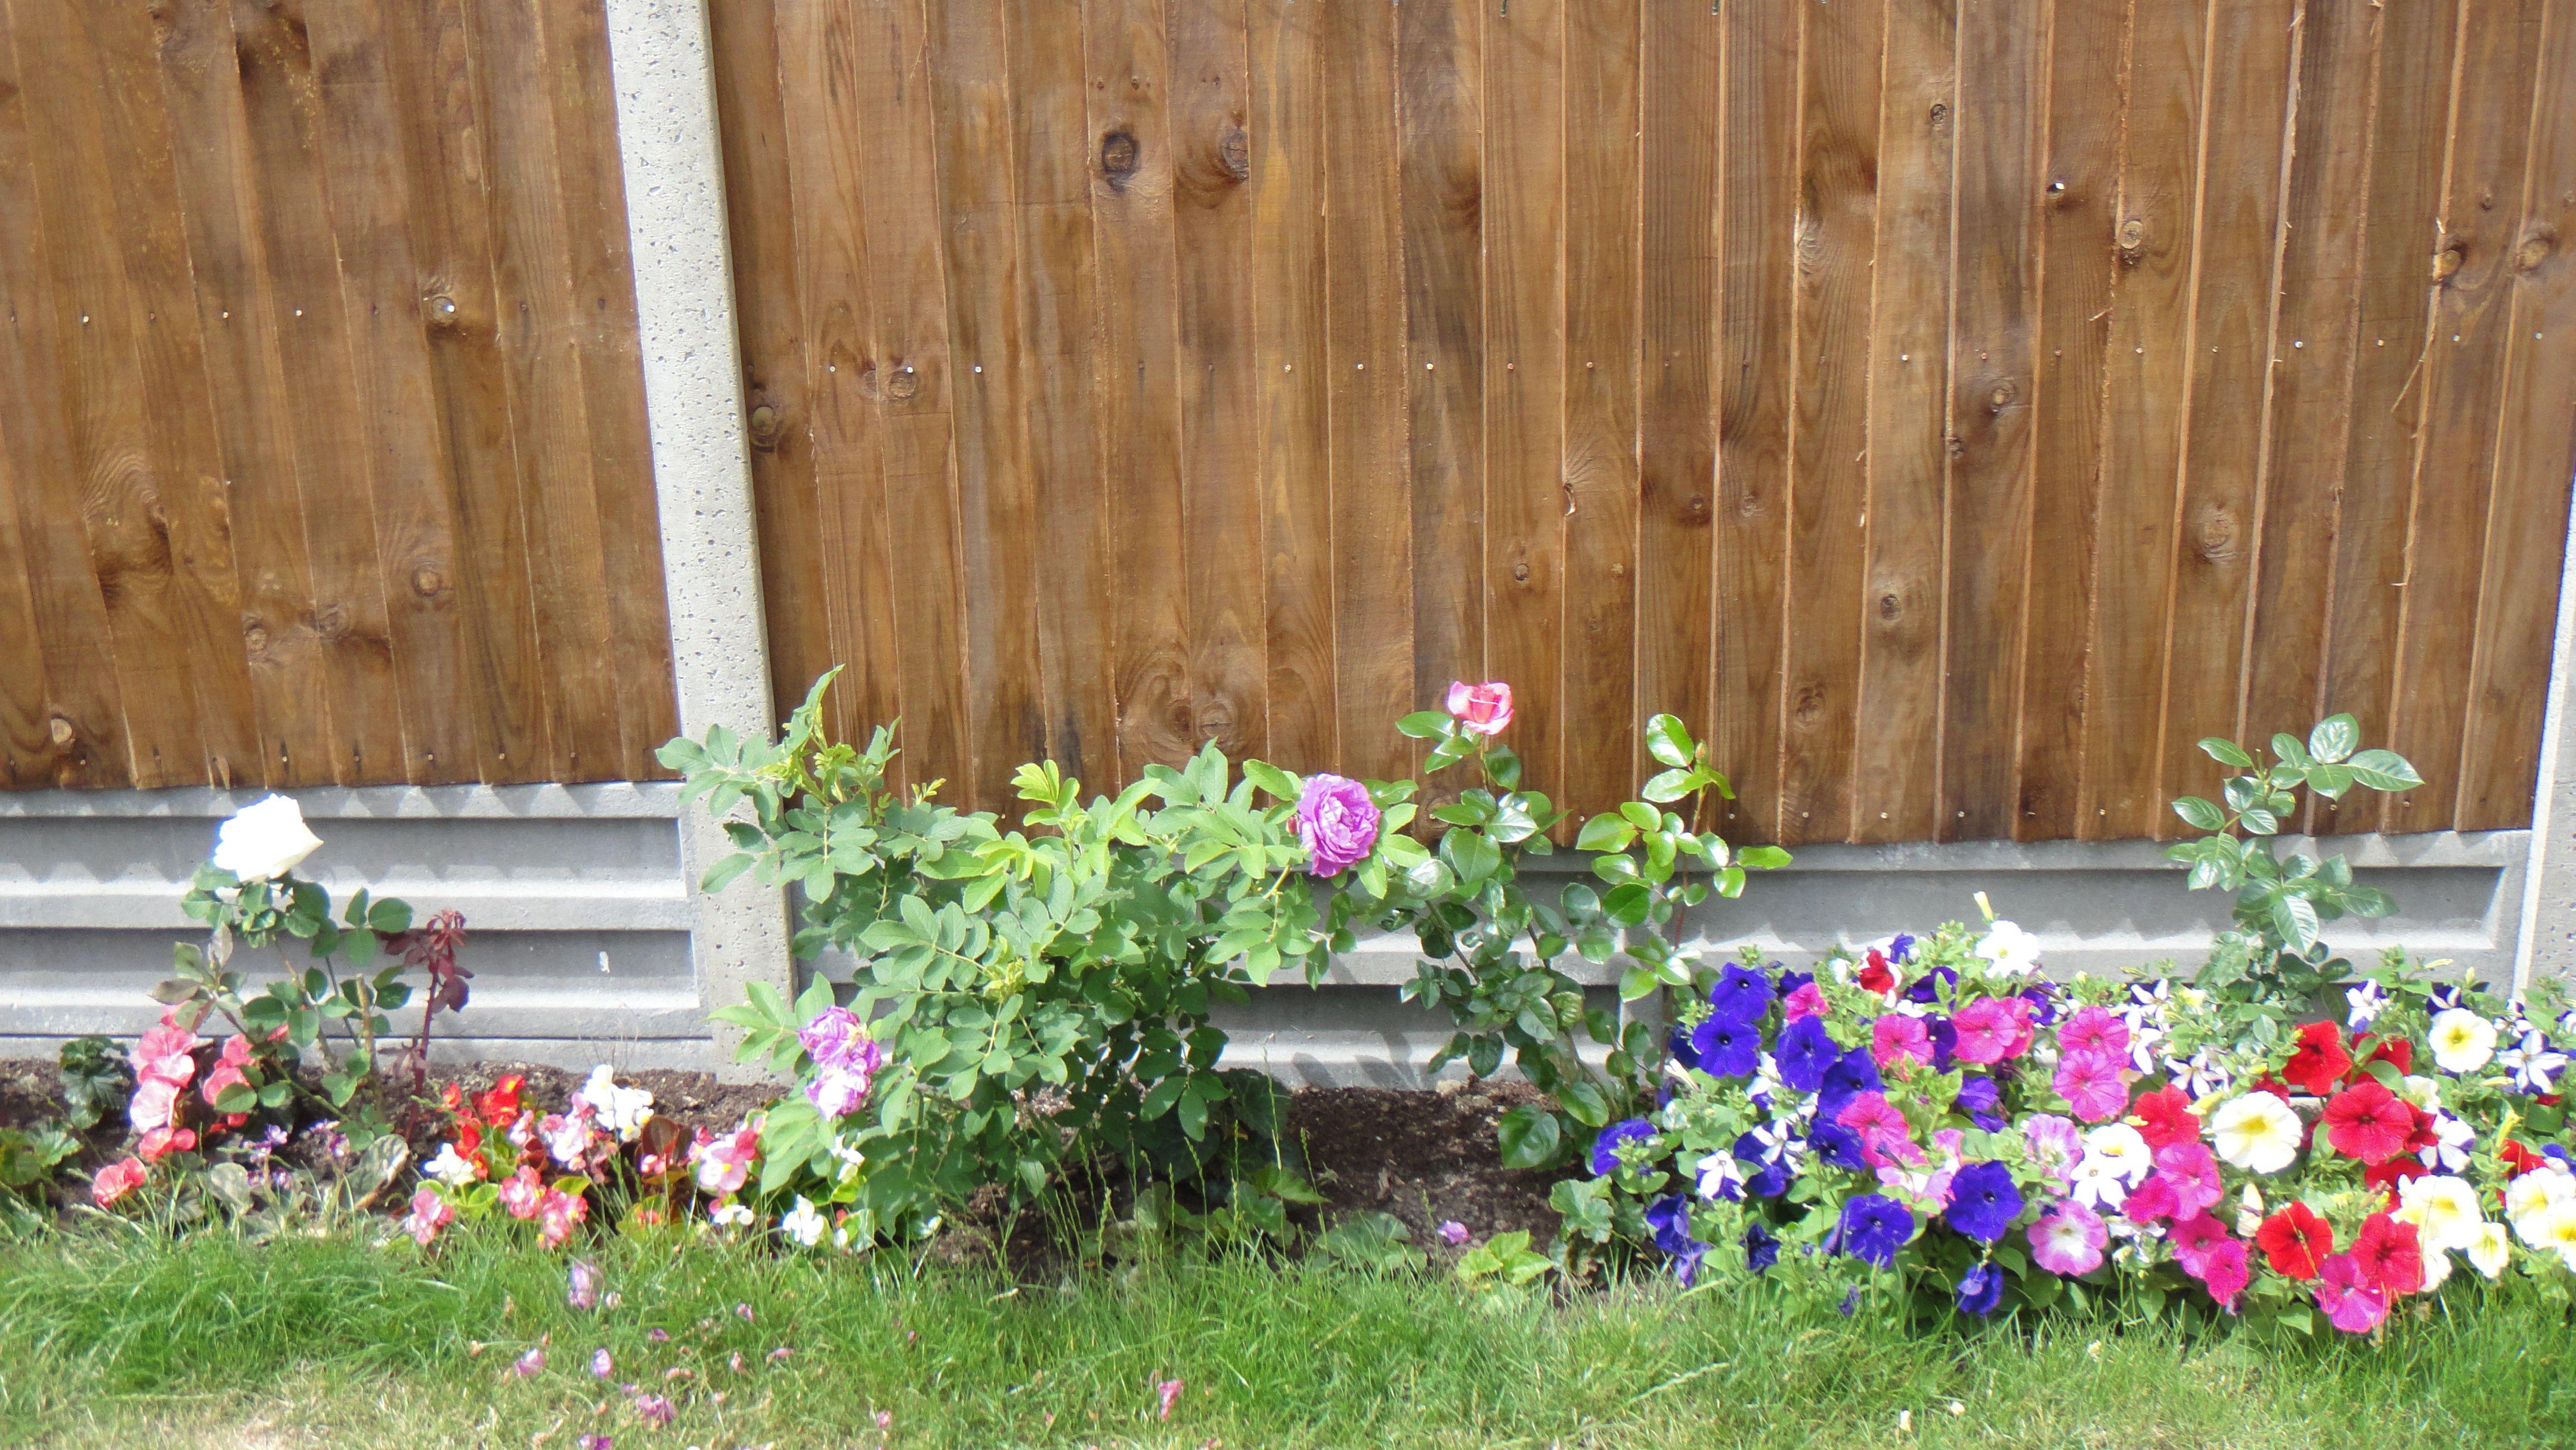 Pin by Janek Farrier-Smith on Garden Project | Pinterest | Garden ...